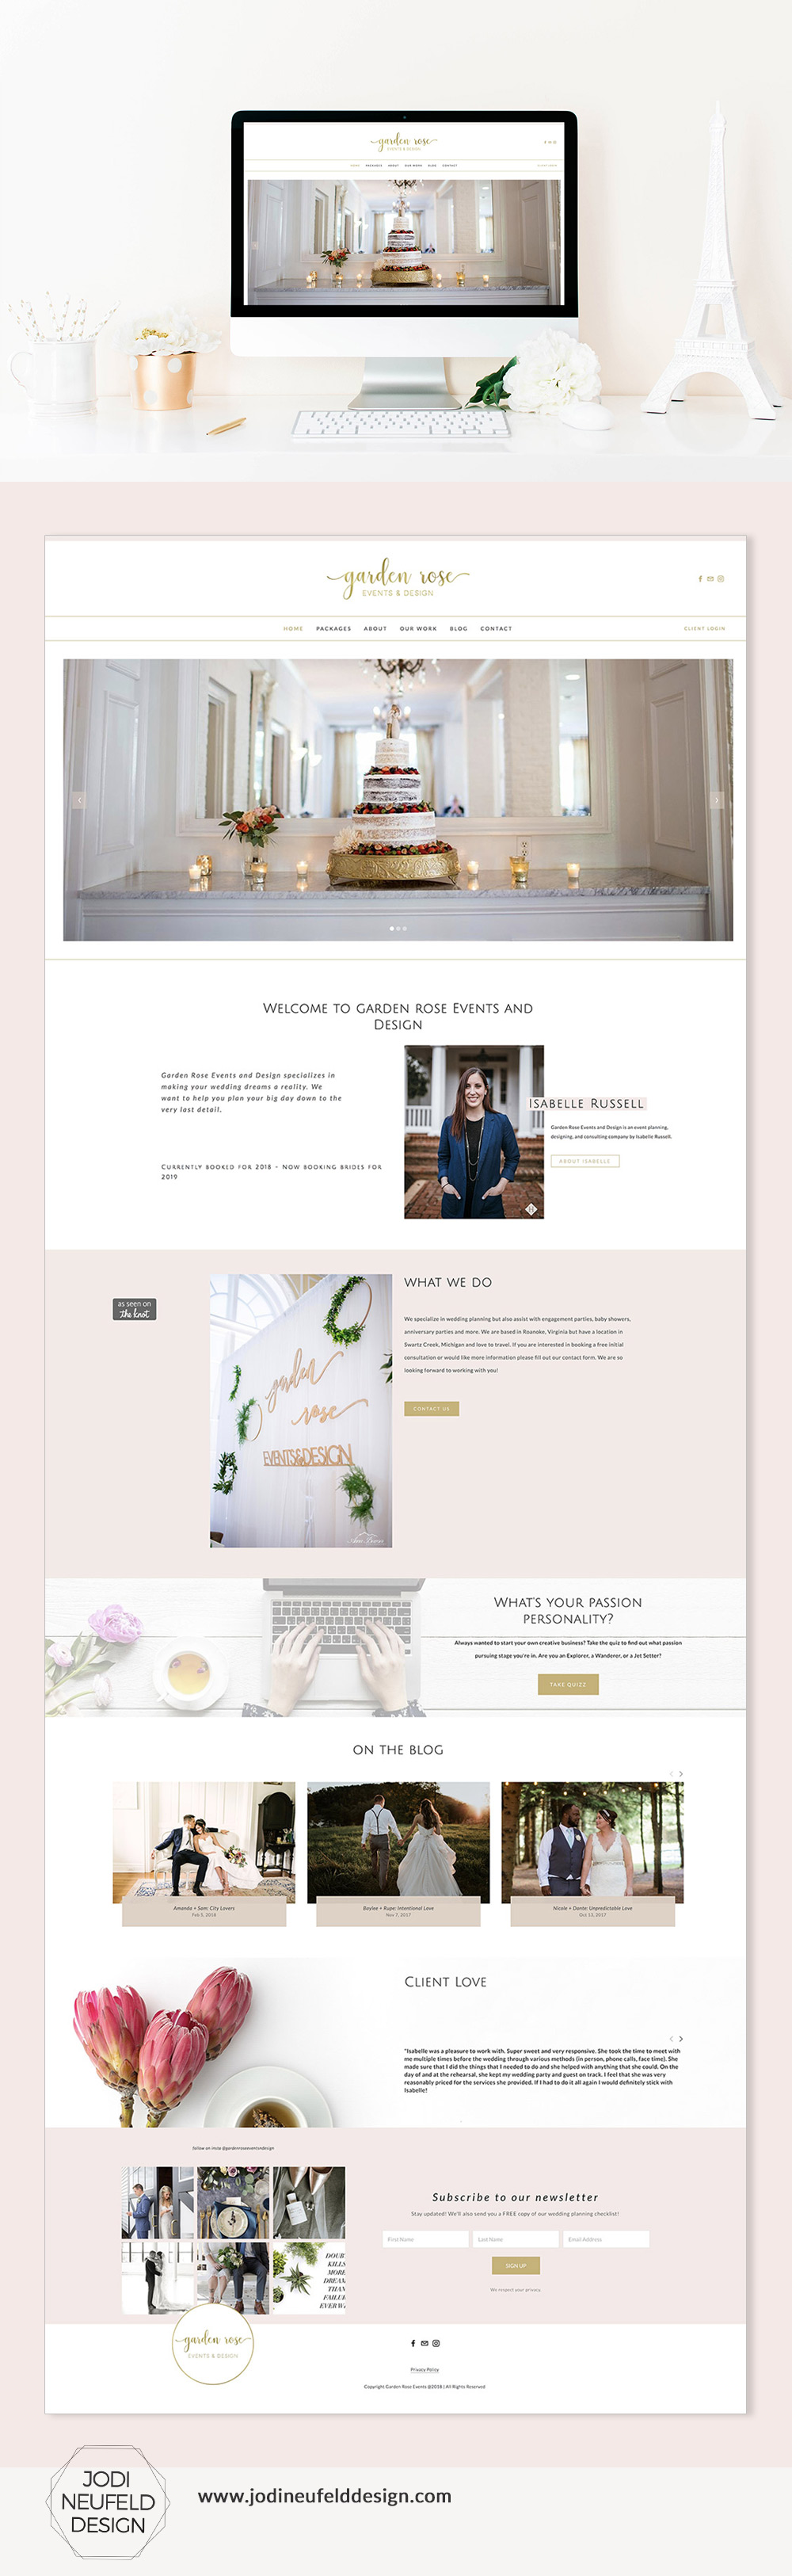 Home page of Garden Rose Events & Design wedding planner website | Squarespace web design by Jodi Neufeld Design